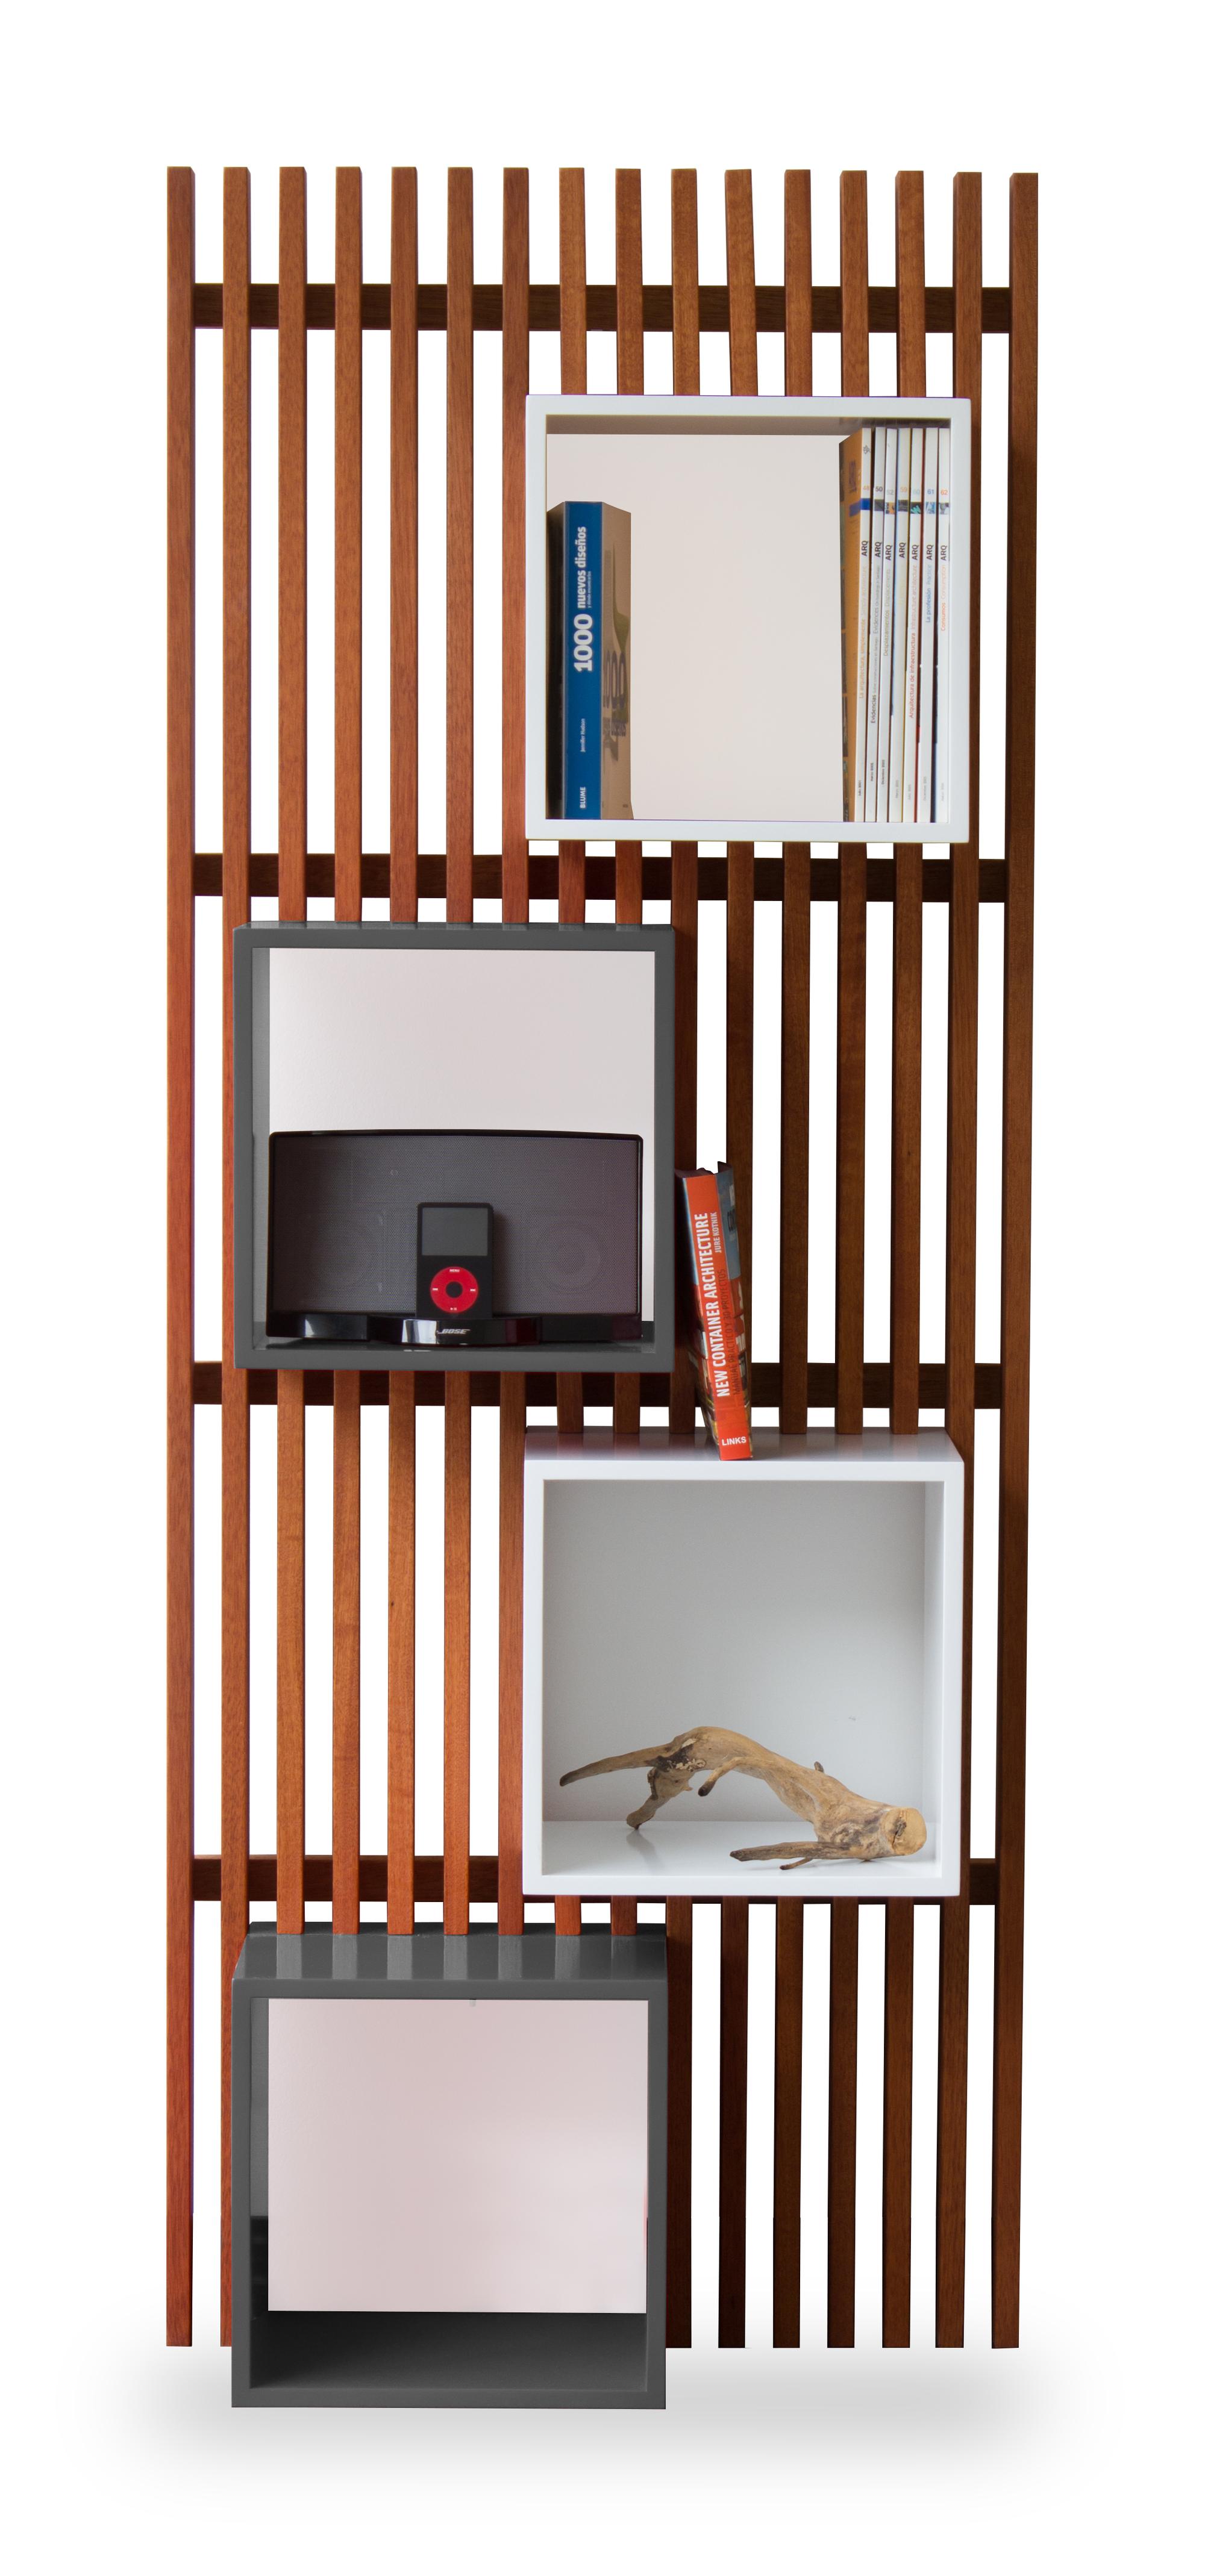 Galer a de l nea de mobiliario 1a10 design 12 for Couchtisch 1 00 x 1 00